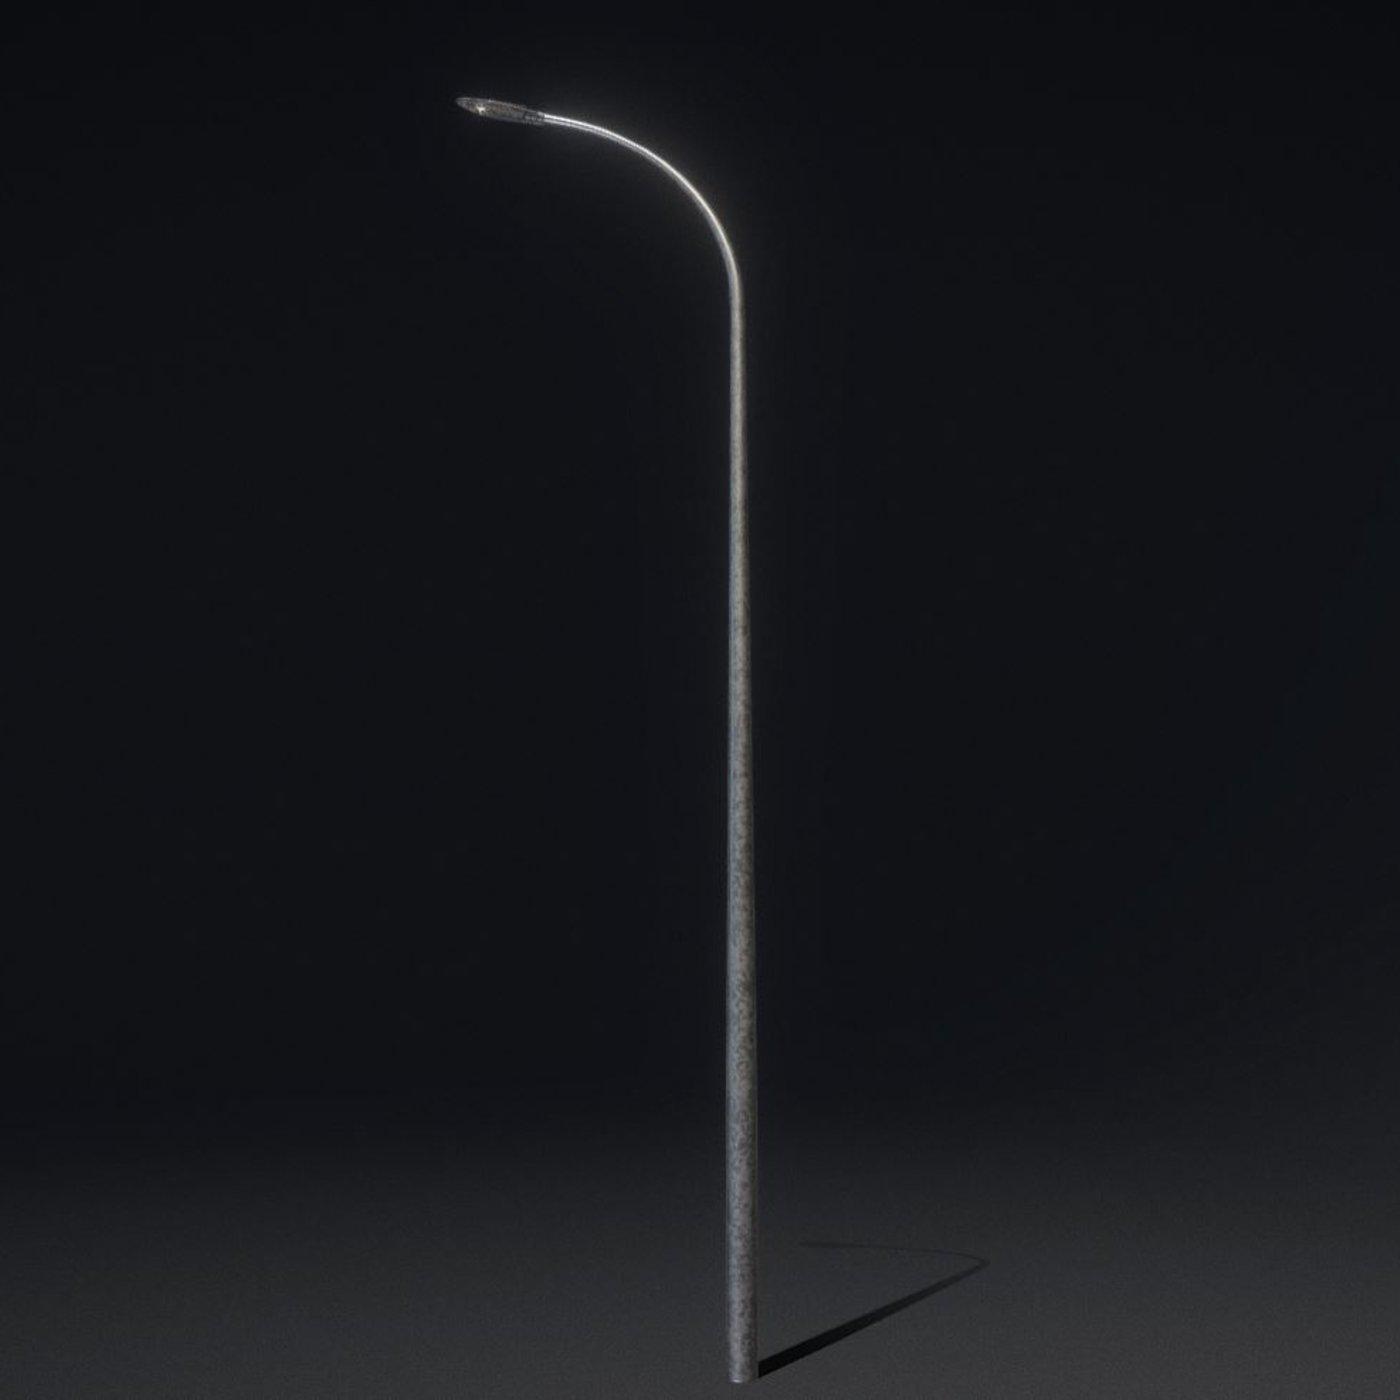 Sci-Fi Street Light 14 version 13 6m with pole 1  Blender-2.90.1